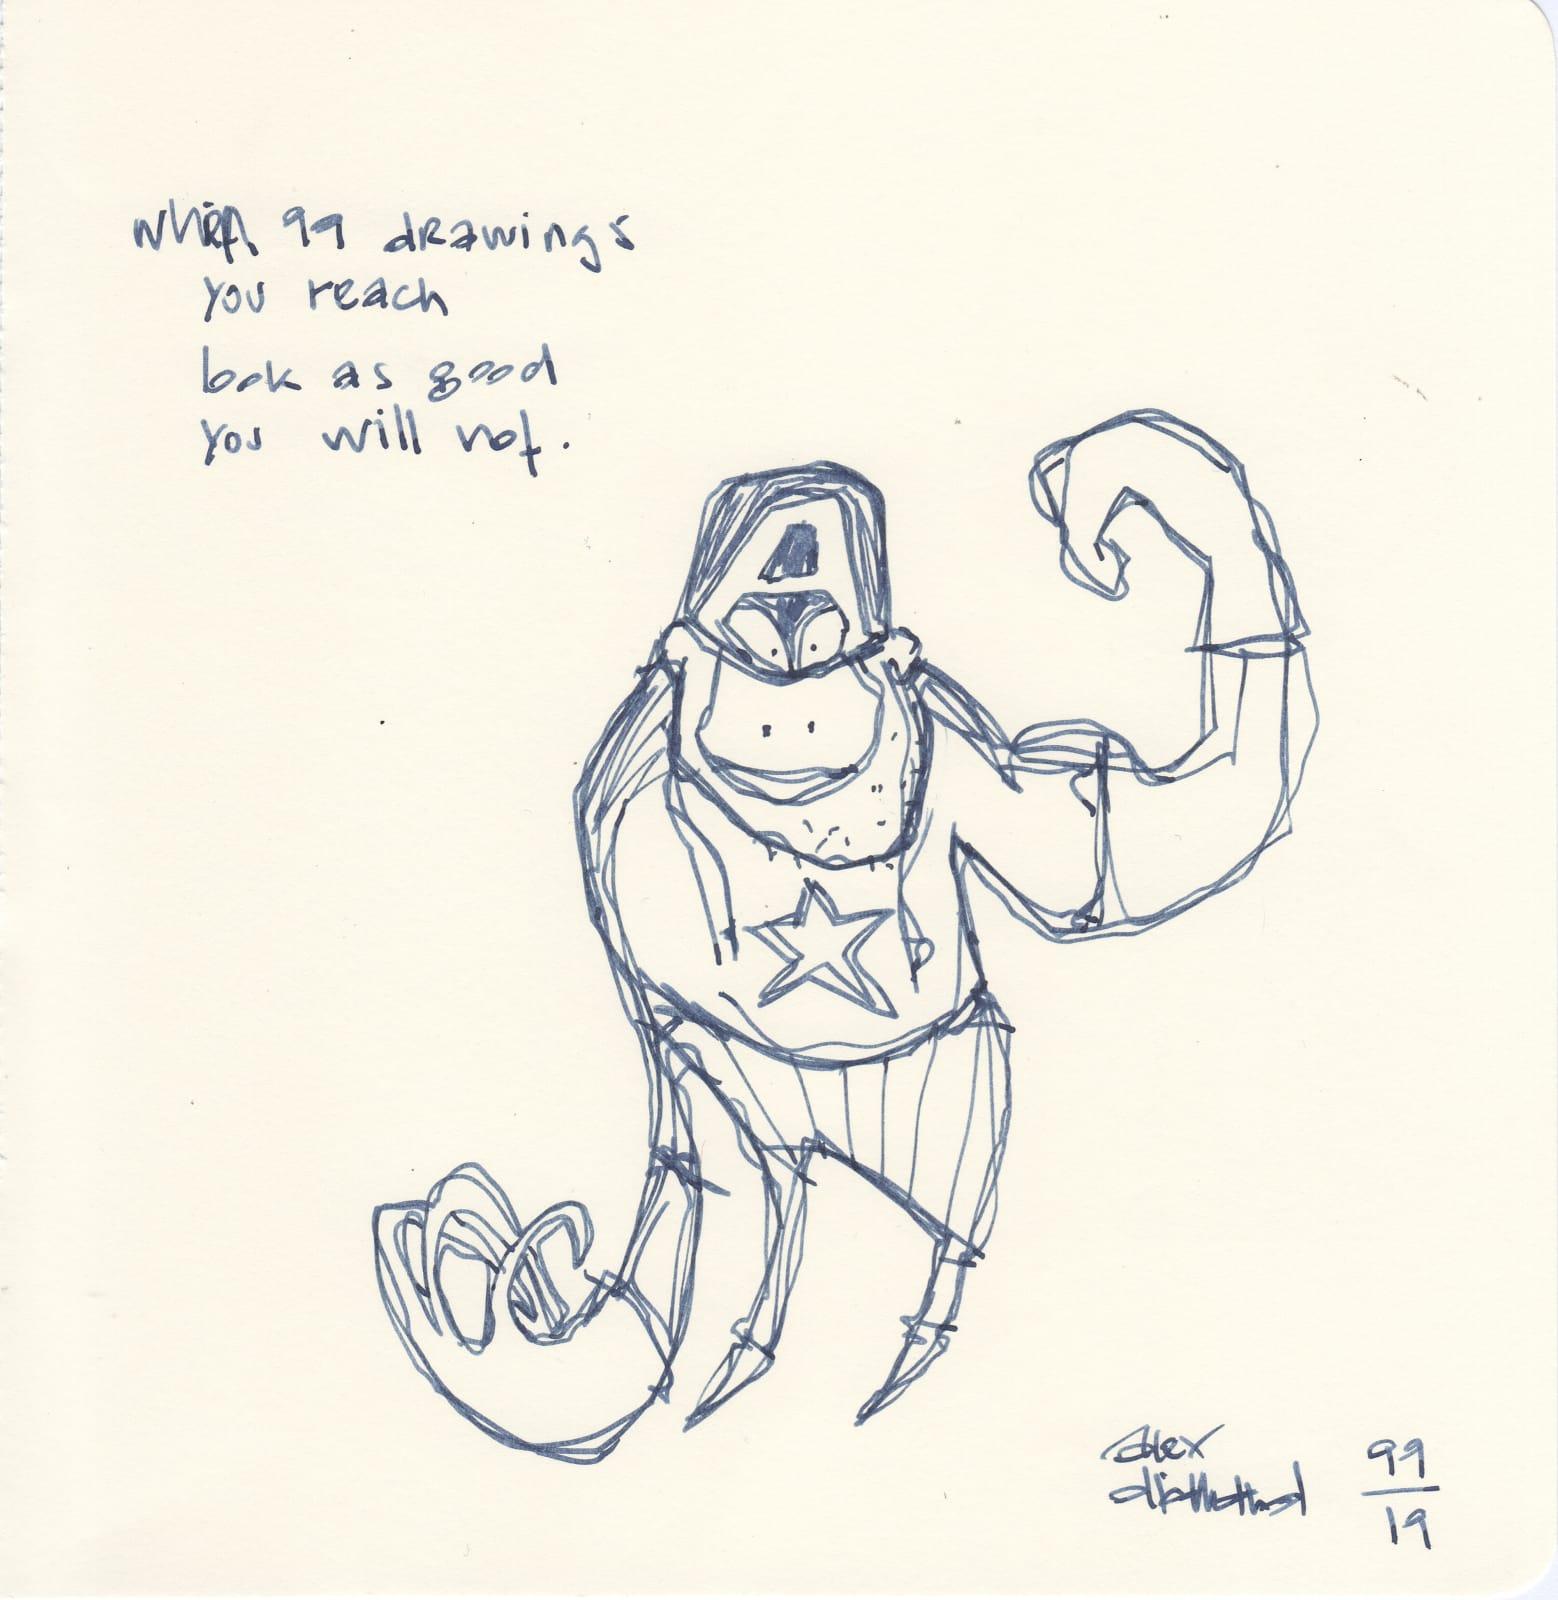 Jörg Heikhaus aka Alex Diamond, Daily Drawing #99, 2019